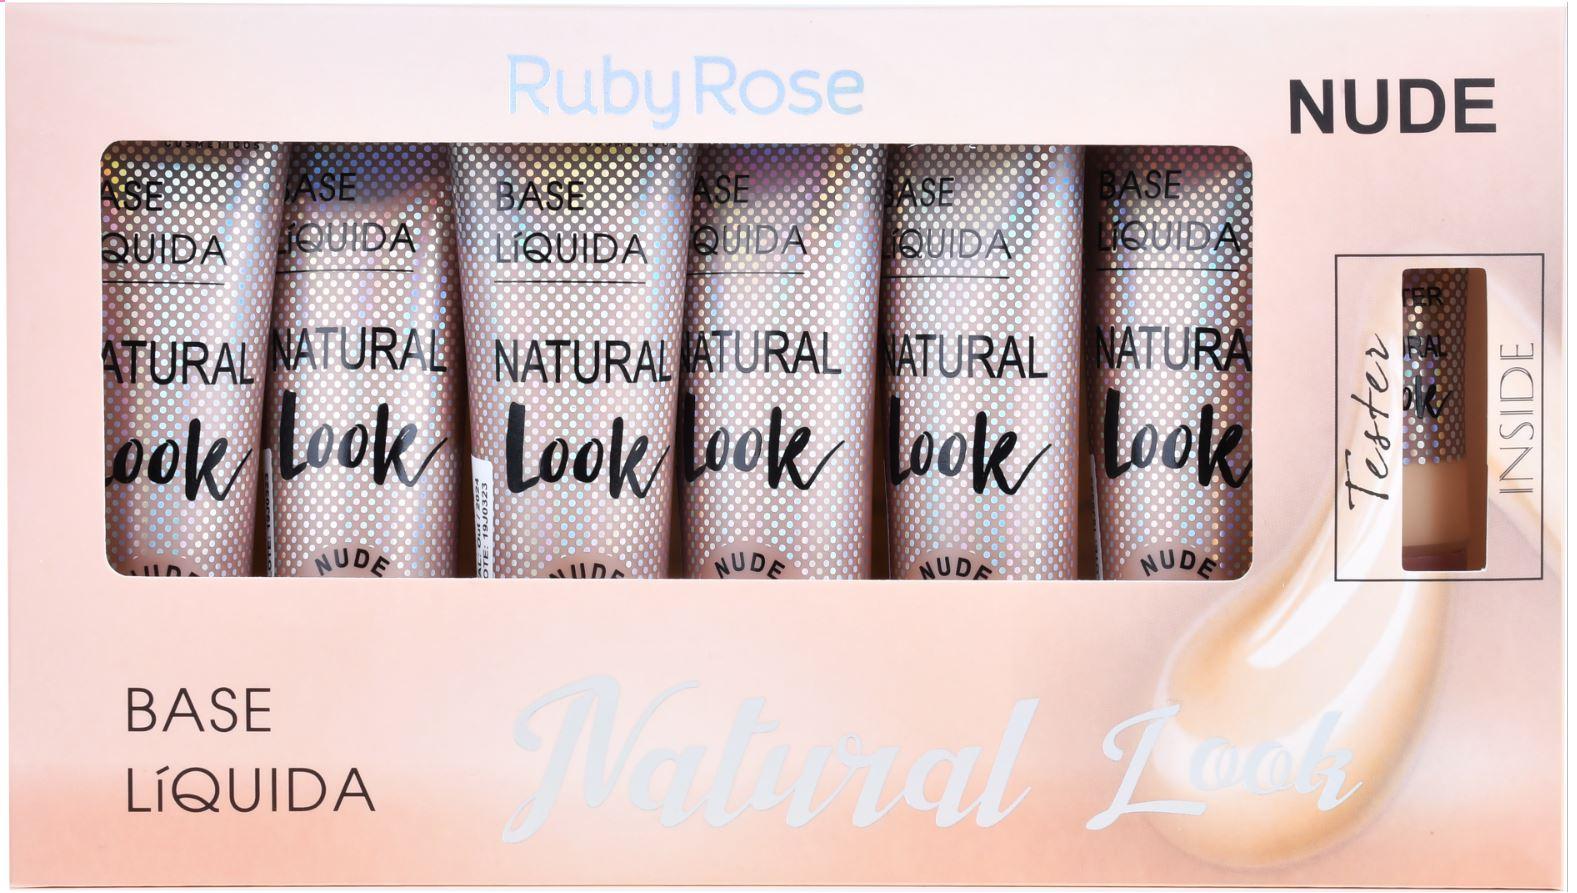 BOX DE BASE NATURAL LOOK NUDE 2 - RUBY ROSE